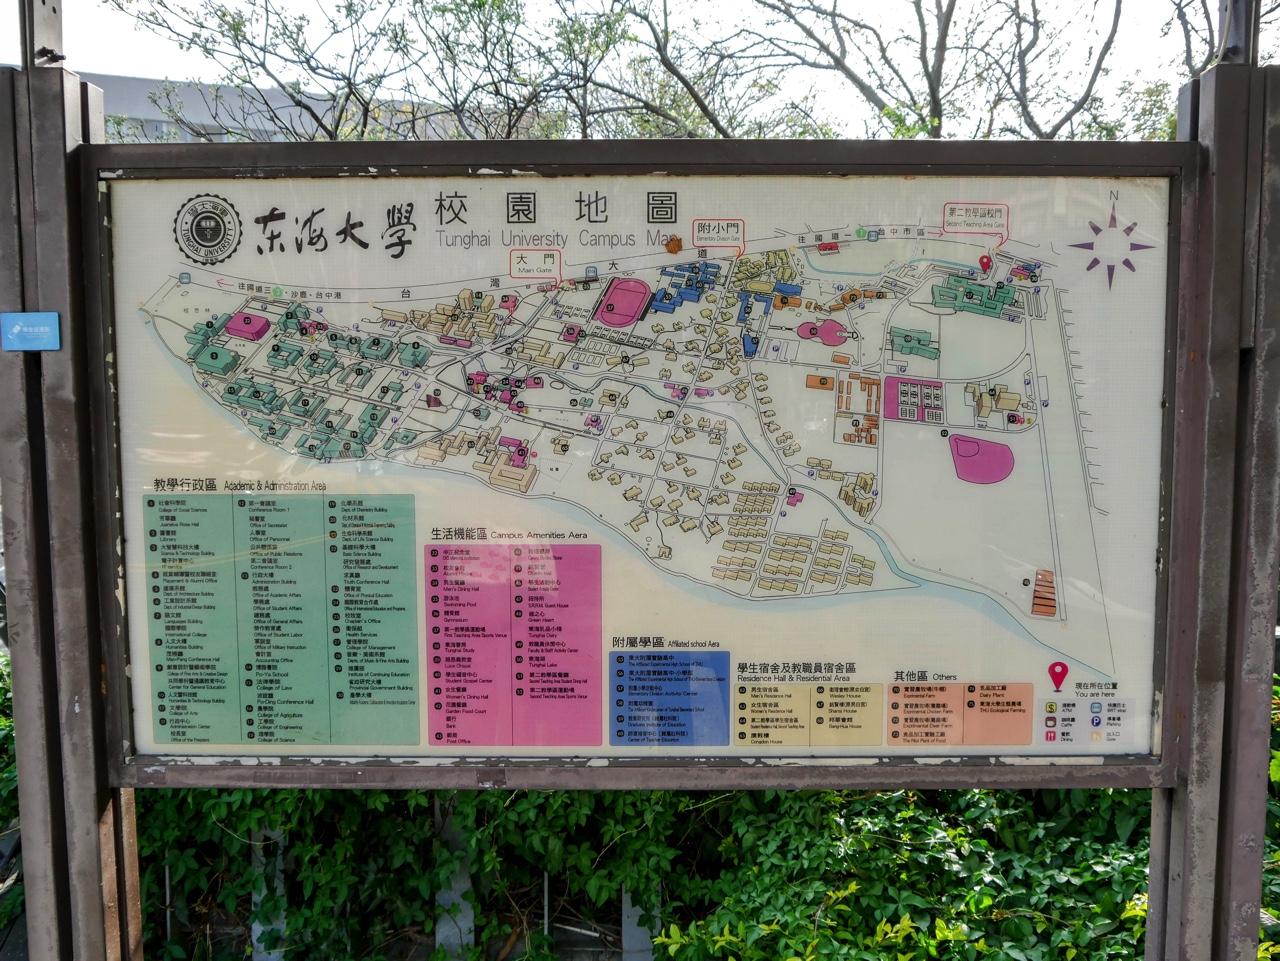 東海大學の全体マップ